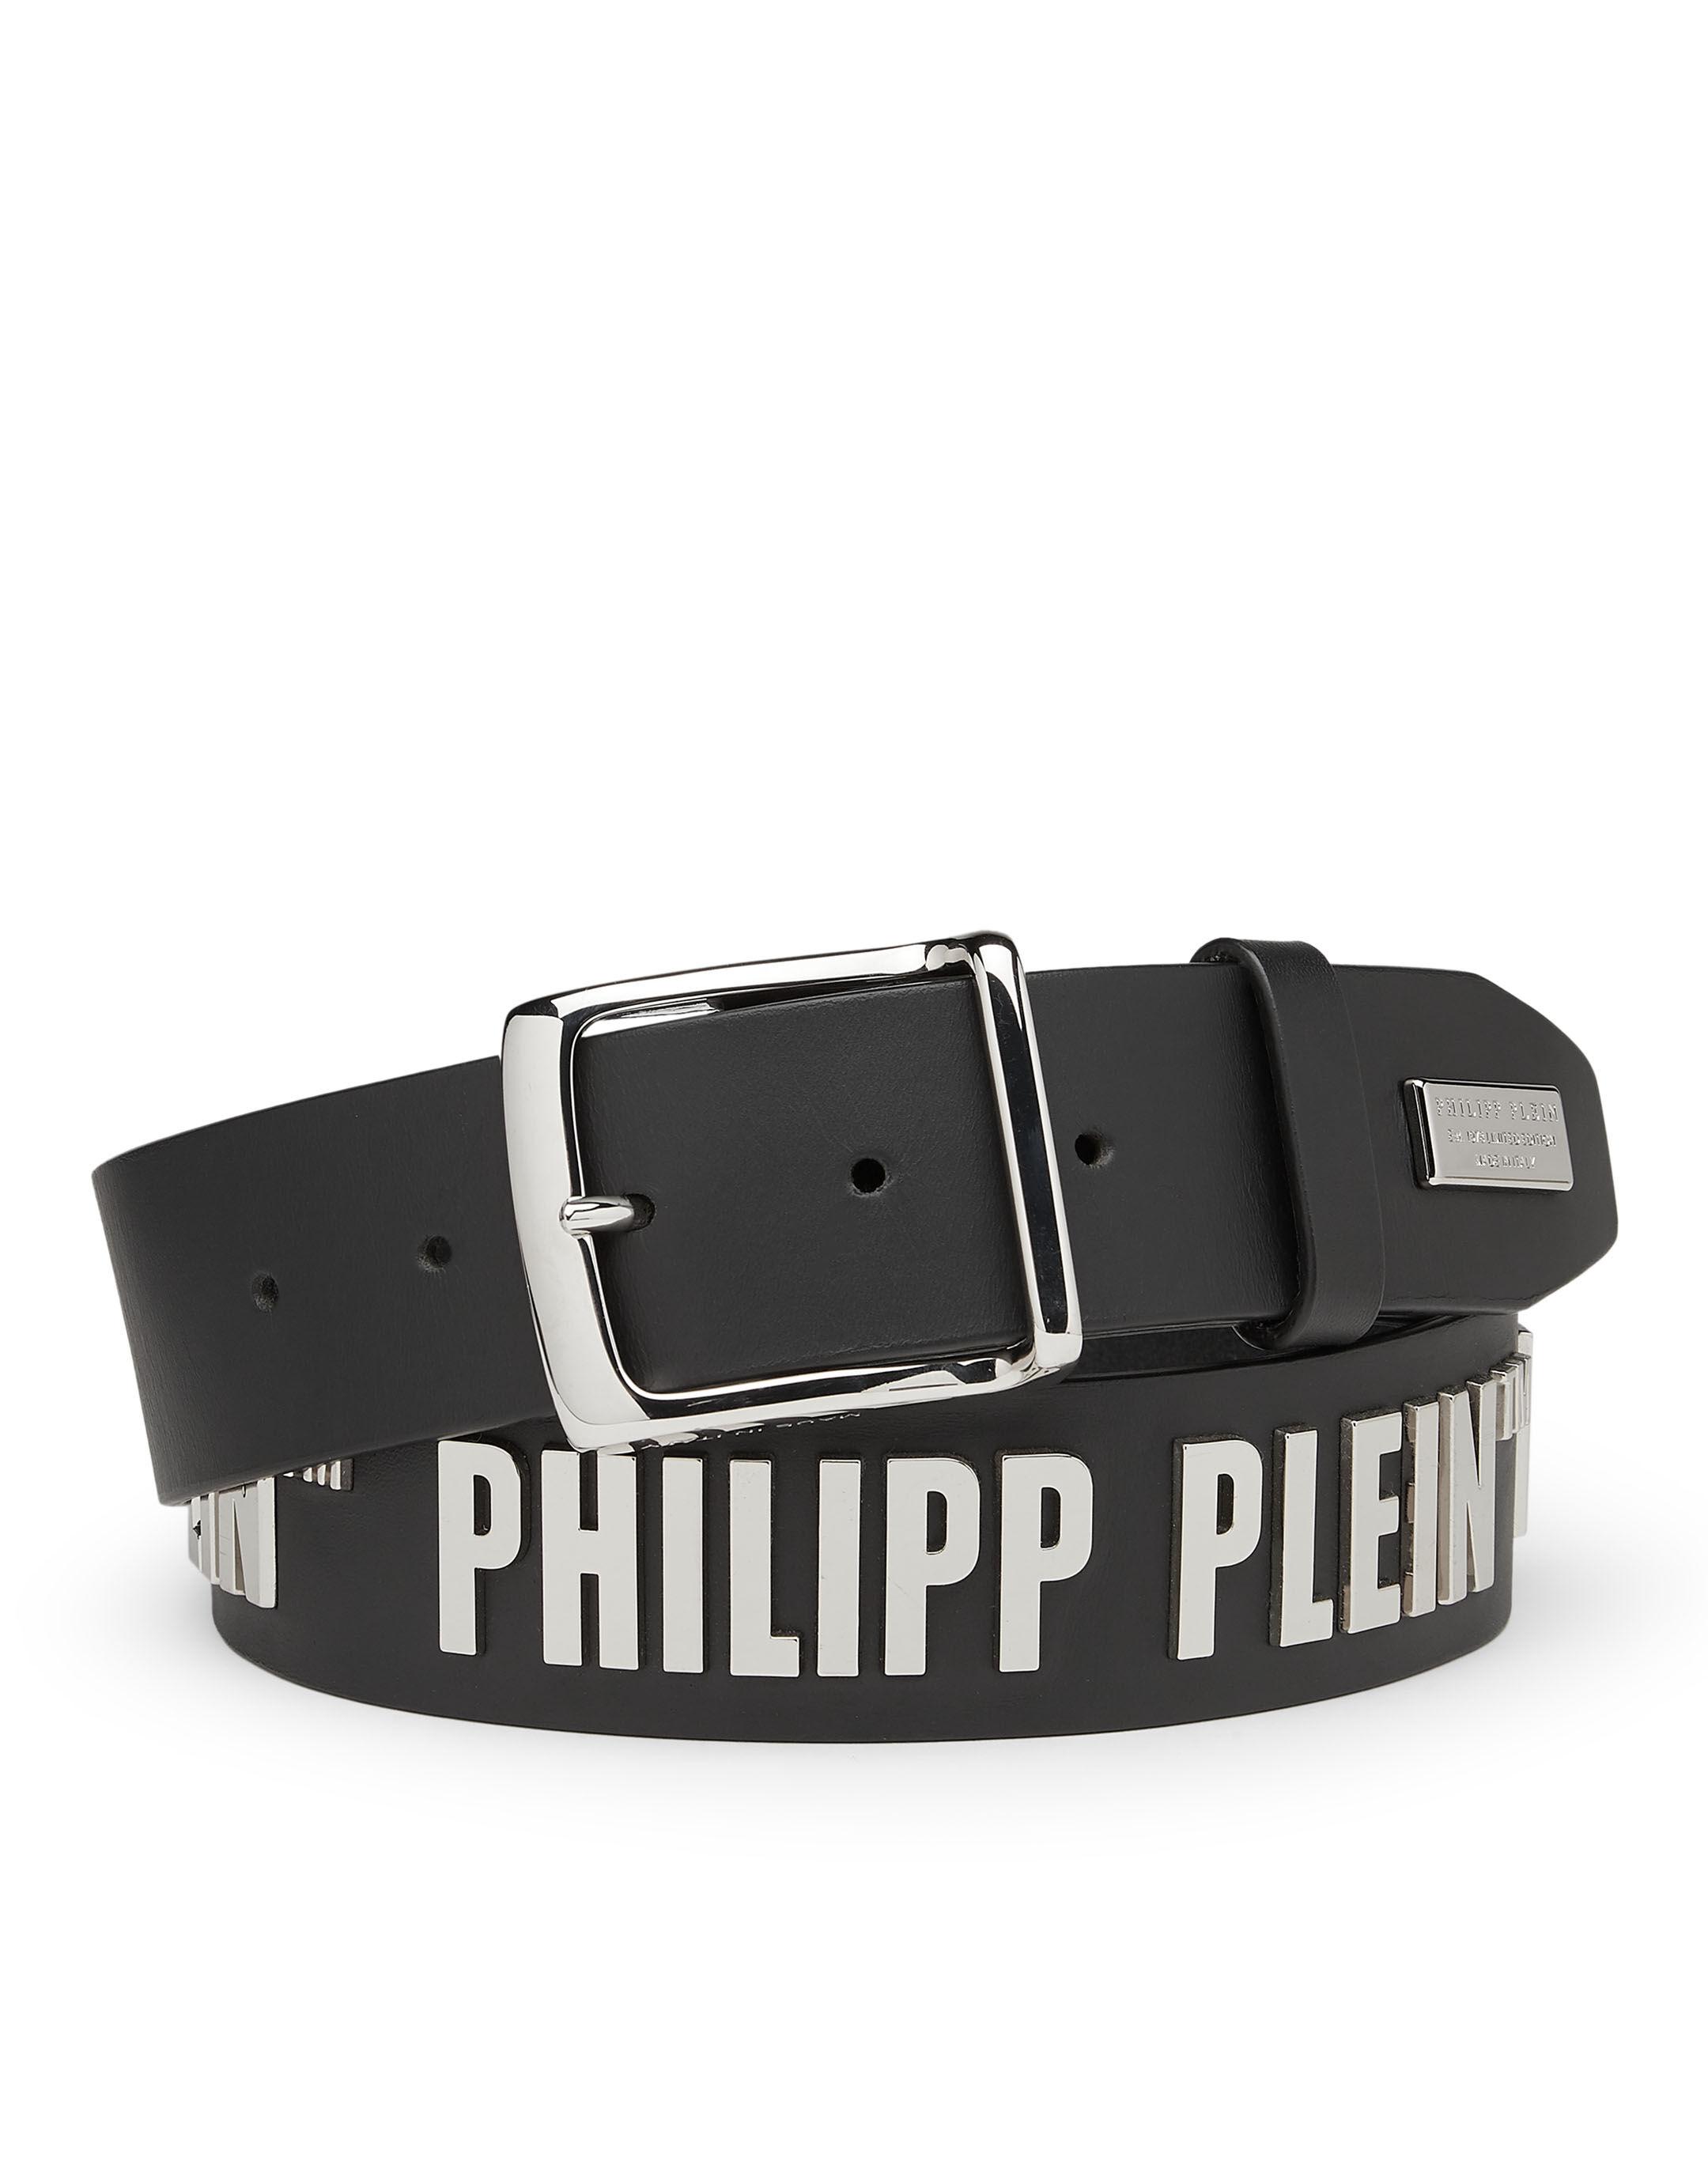 philipp plein sneaker Billig sale, Philipp Plein 'Superman